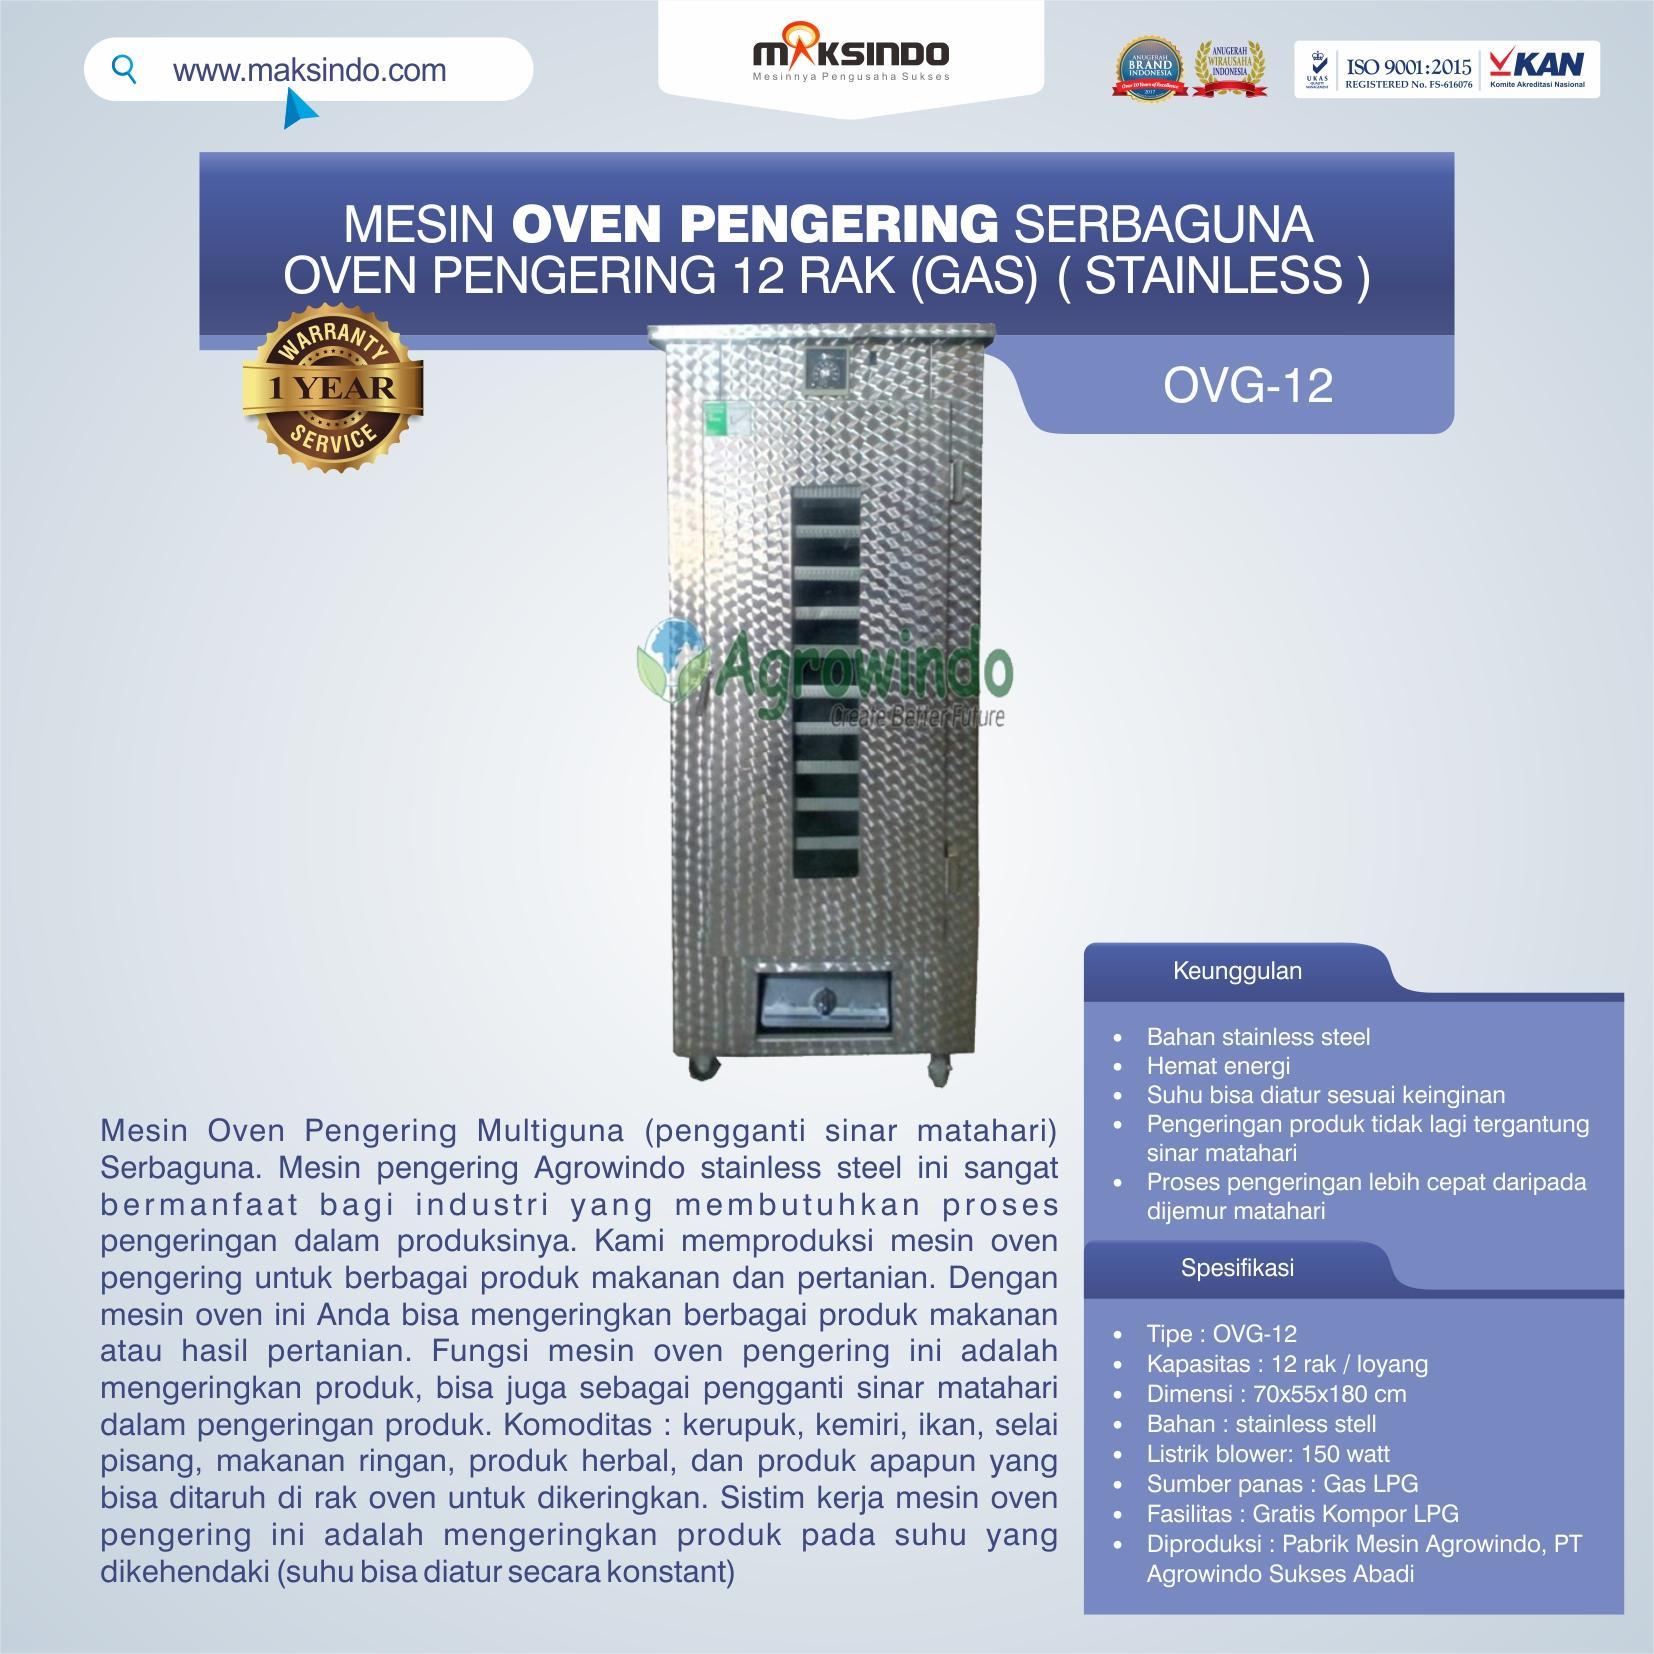 OVG-12 Mesin Oven Pengering Serbaguna 12 Rak (Gas) (Stainless )